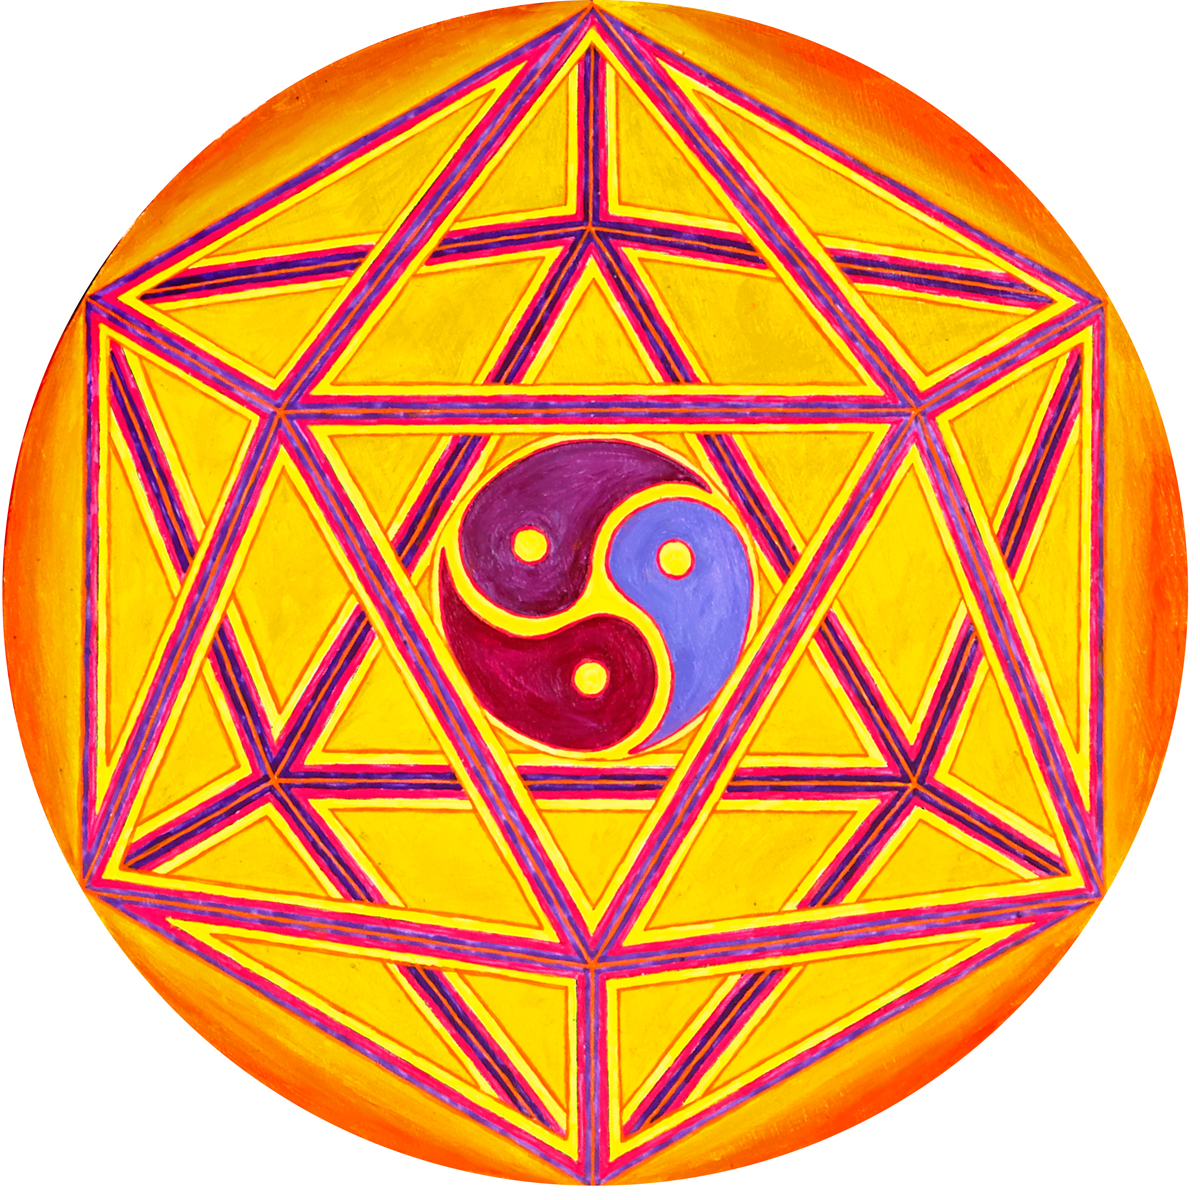 Icosahedral Cage